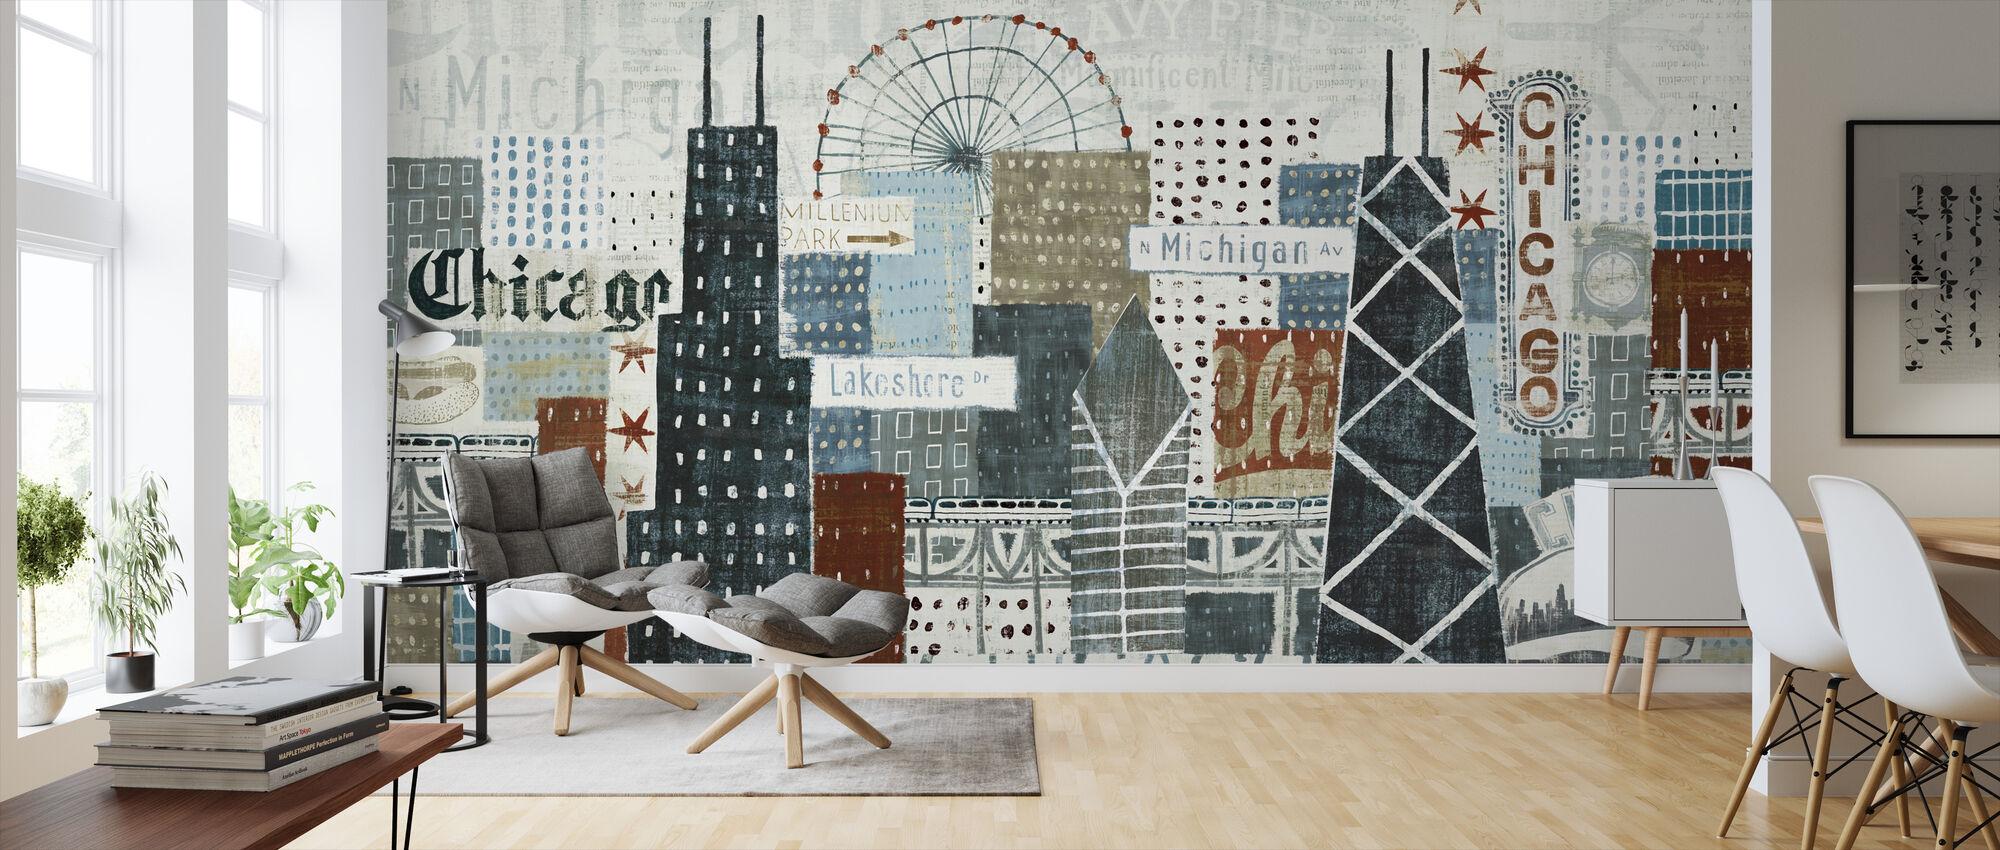 Hey Chicago - Wallpaper - Living Room